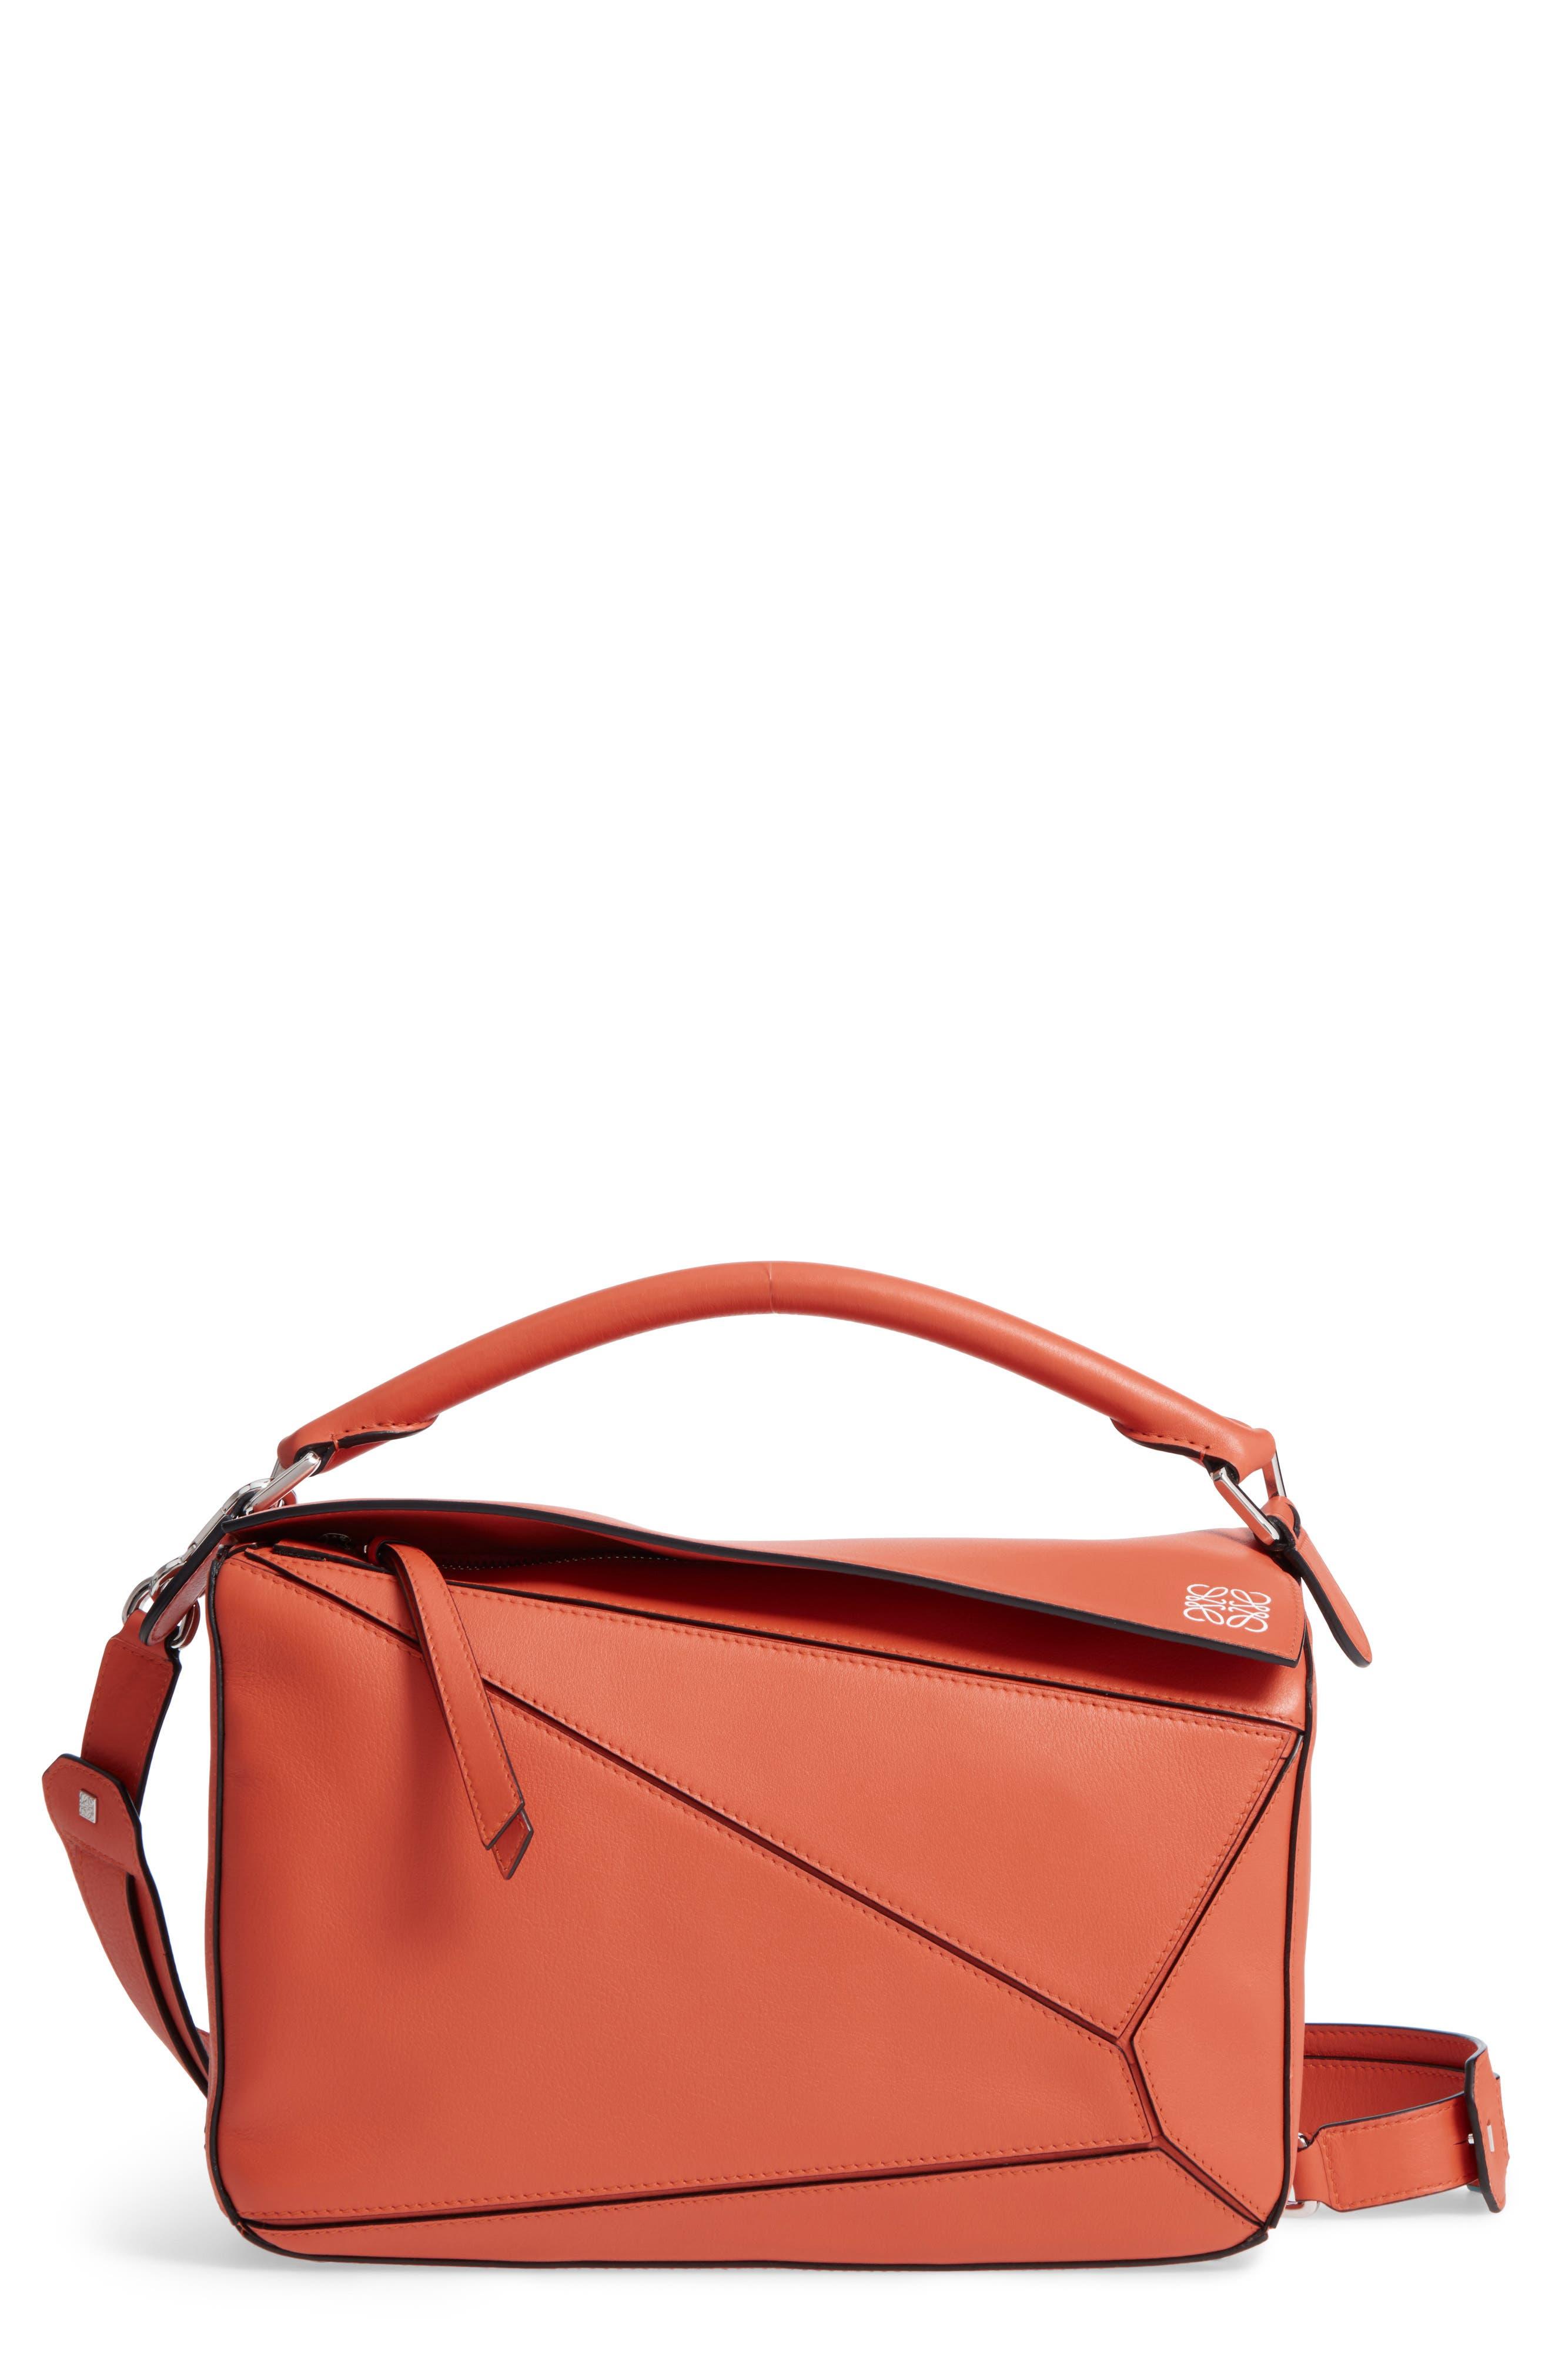 Main Image - Loewe 'Small Puzzle' Calfskin Leather Bag